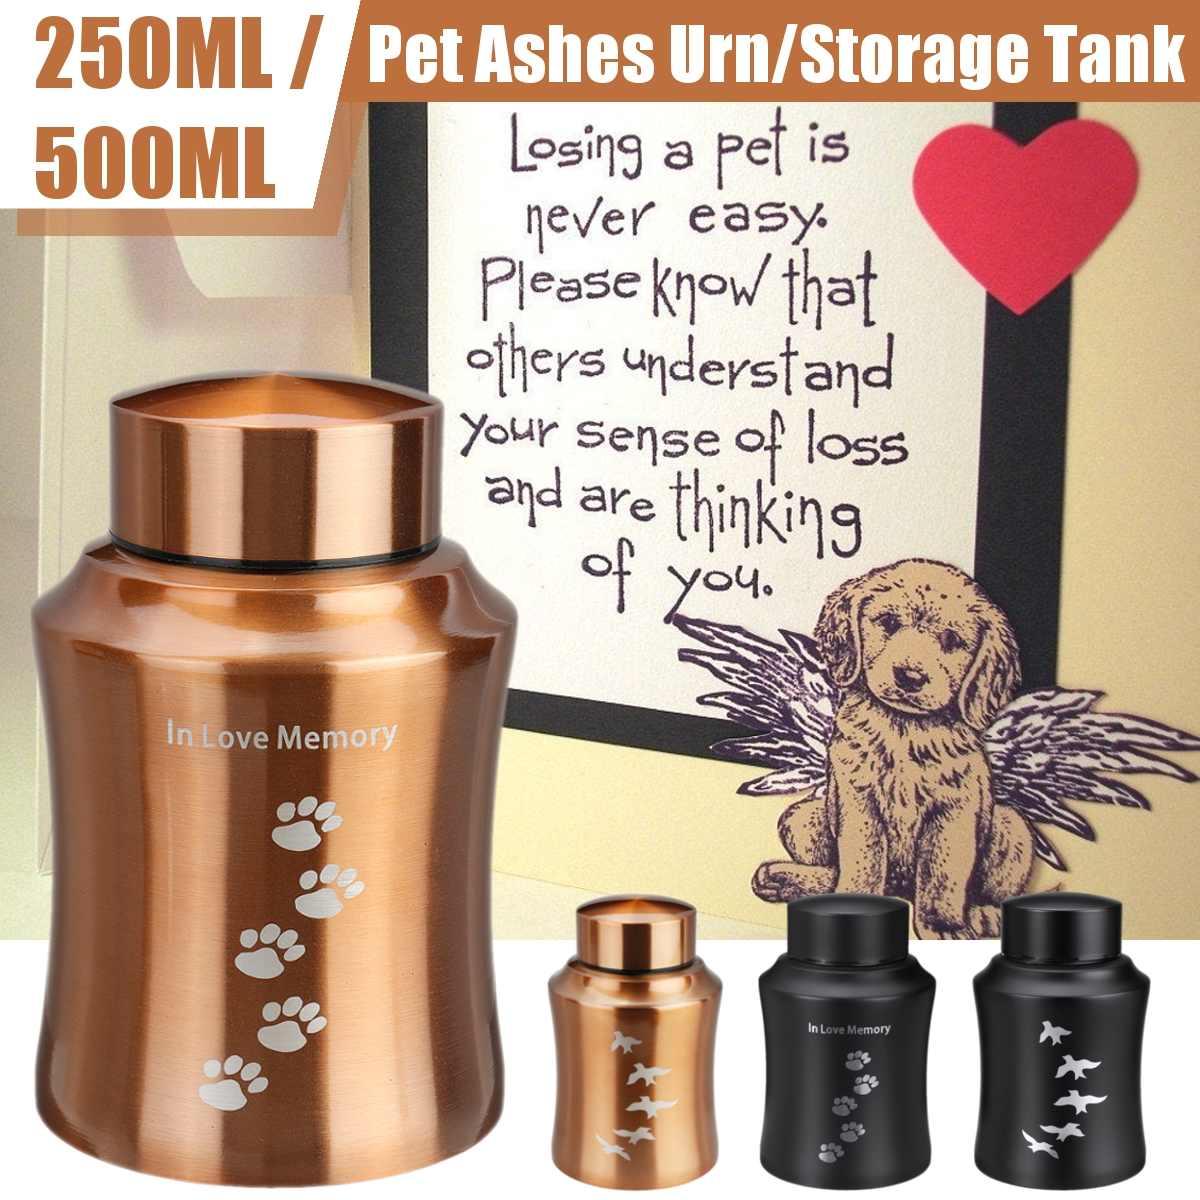 Gold/Black Stainless Steel Urns Pets Dog Cat Birds Mouse Cremation Ashes Urn Keepsake Casket Columbarium Pet Memorials 250/500ML